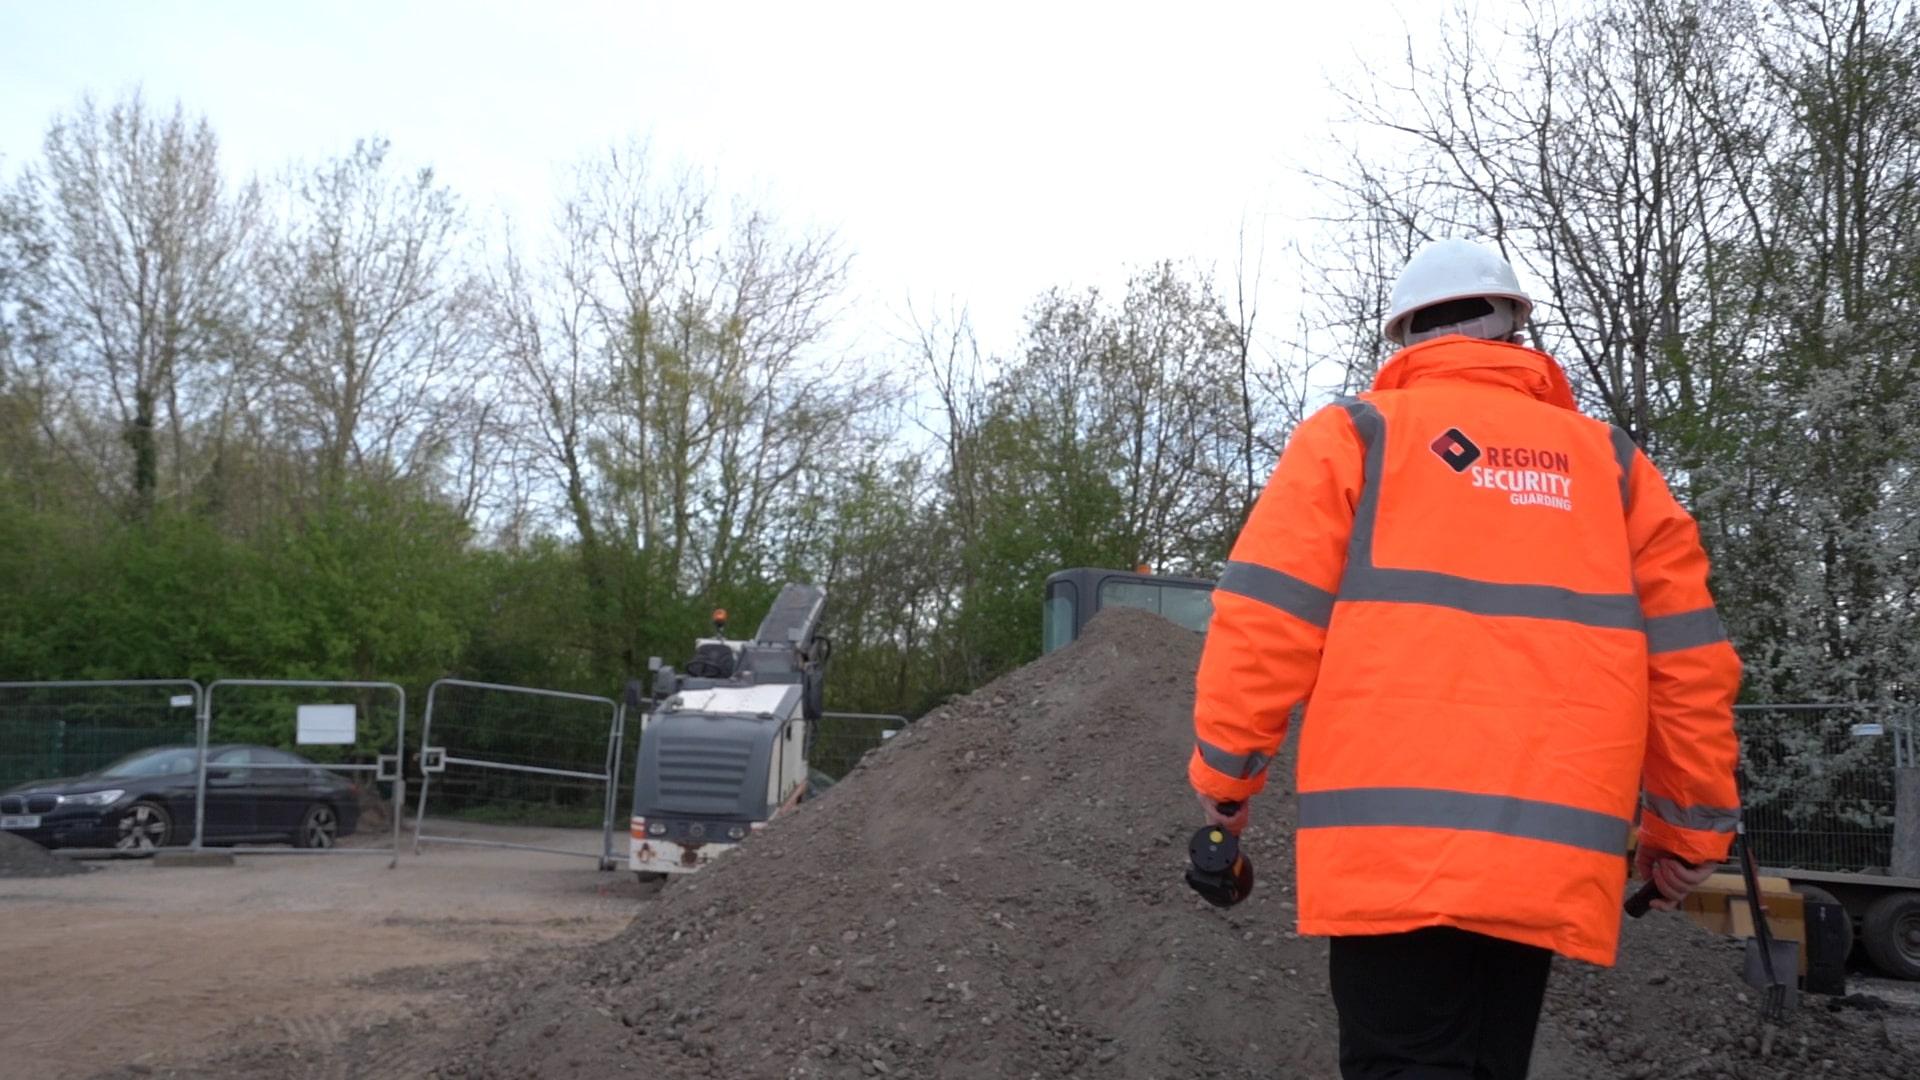 building site security